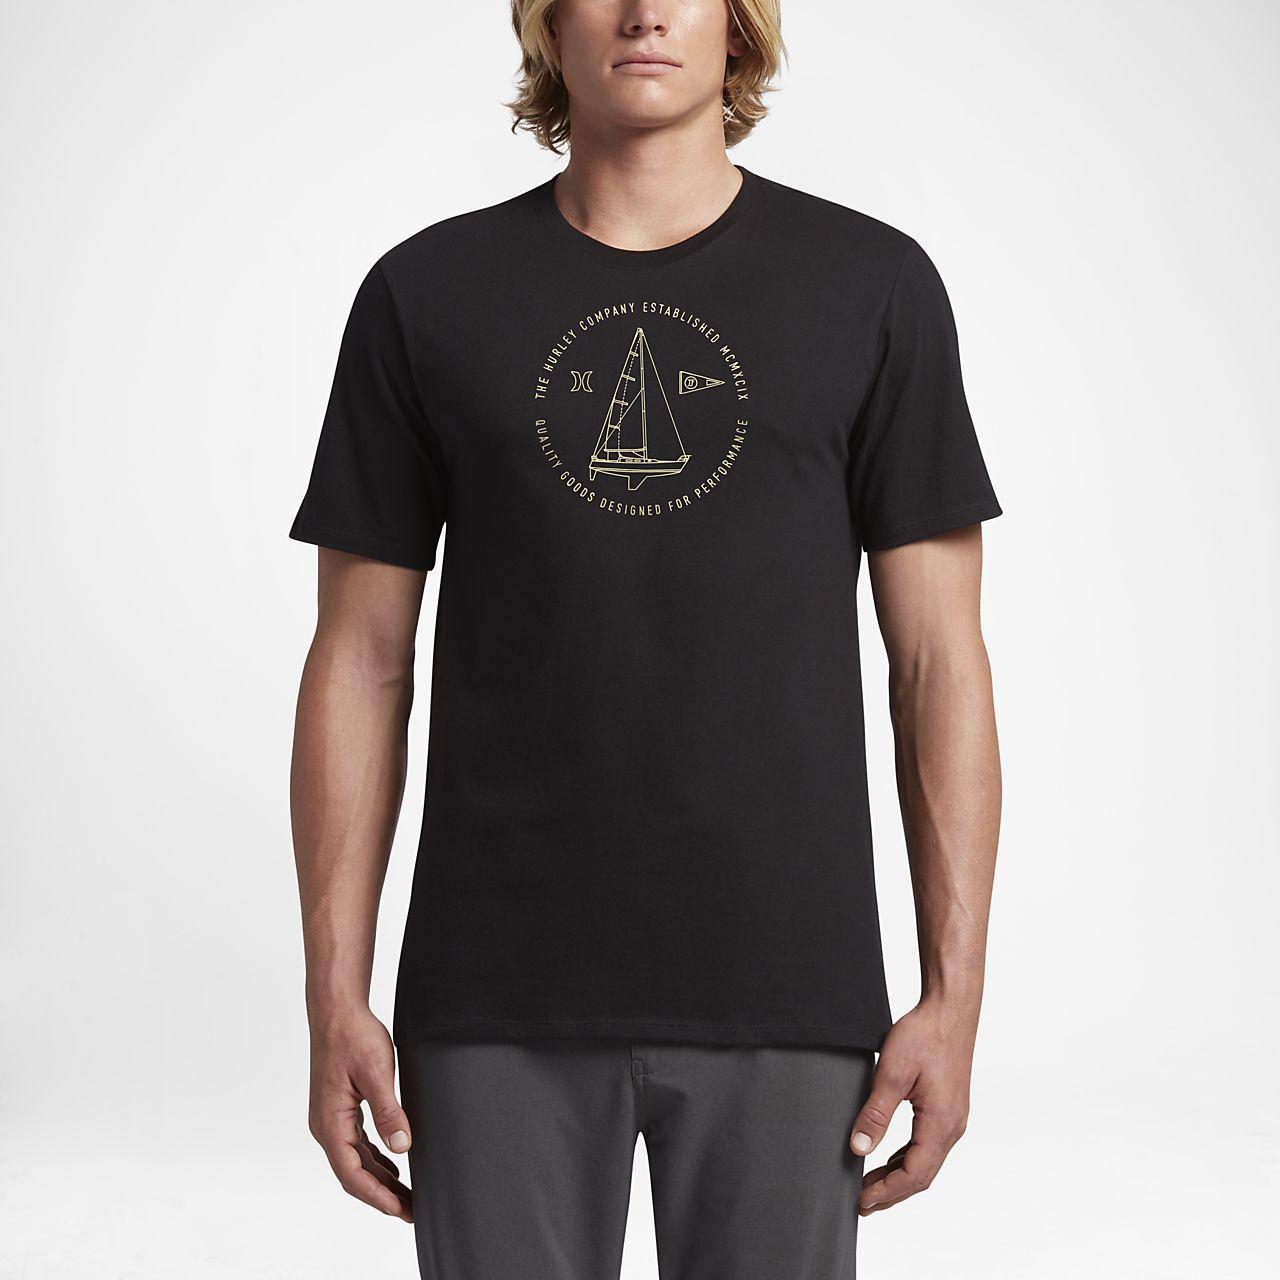 Nike Mens T-Shirt - Nike Hurley JJF Photo Premium White M75g8380